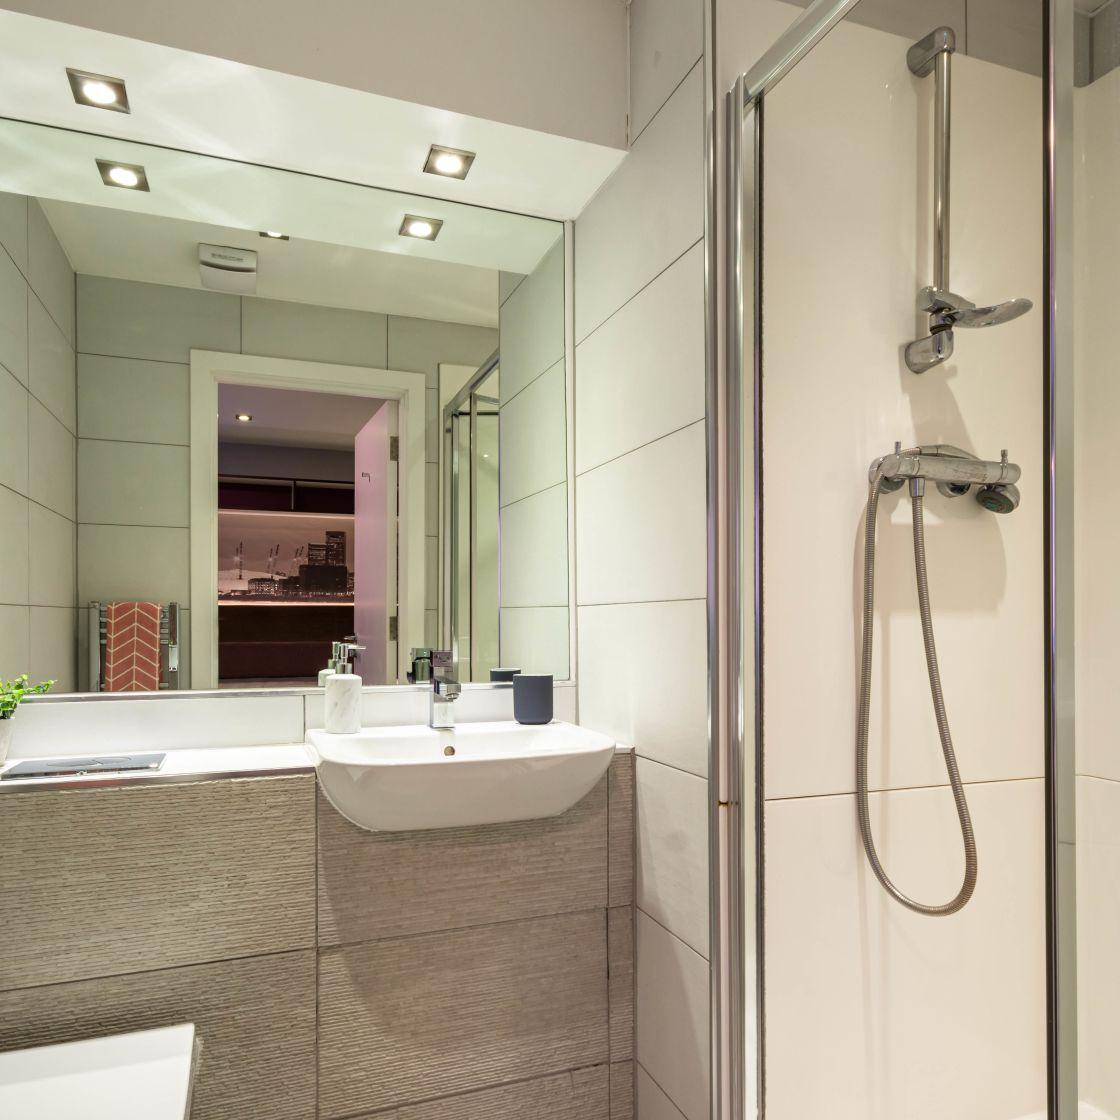 Elegance Student Apartment in Leeds, En-suite bathroom with shower. IconInc, The Edge